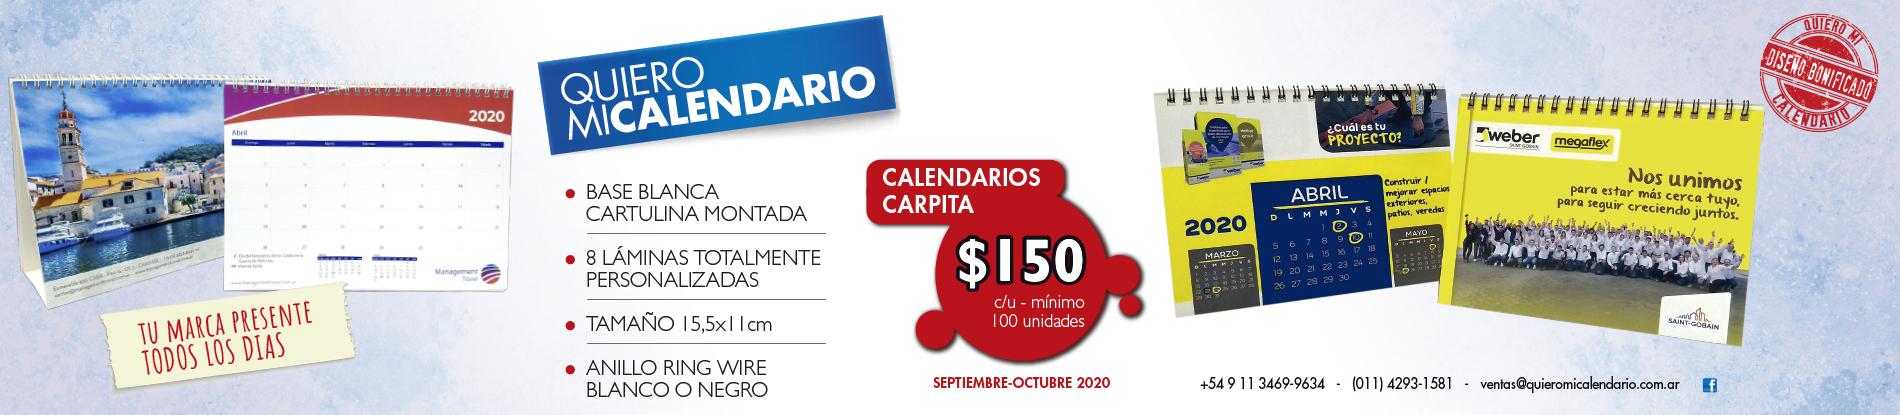 BANNER 2 TAMAÑO 1900x415px